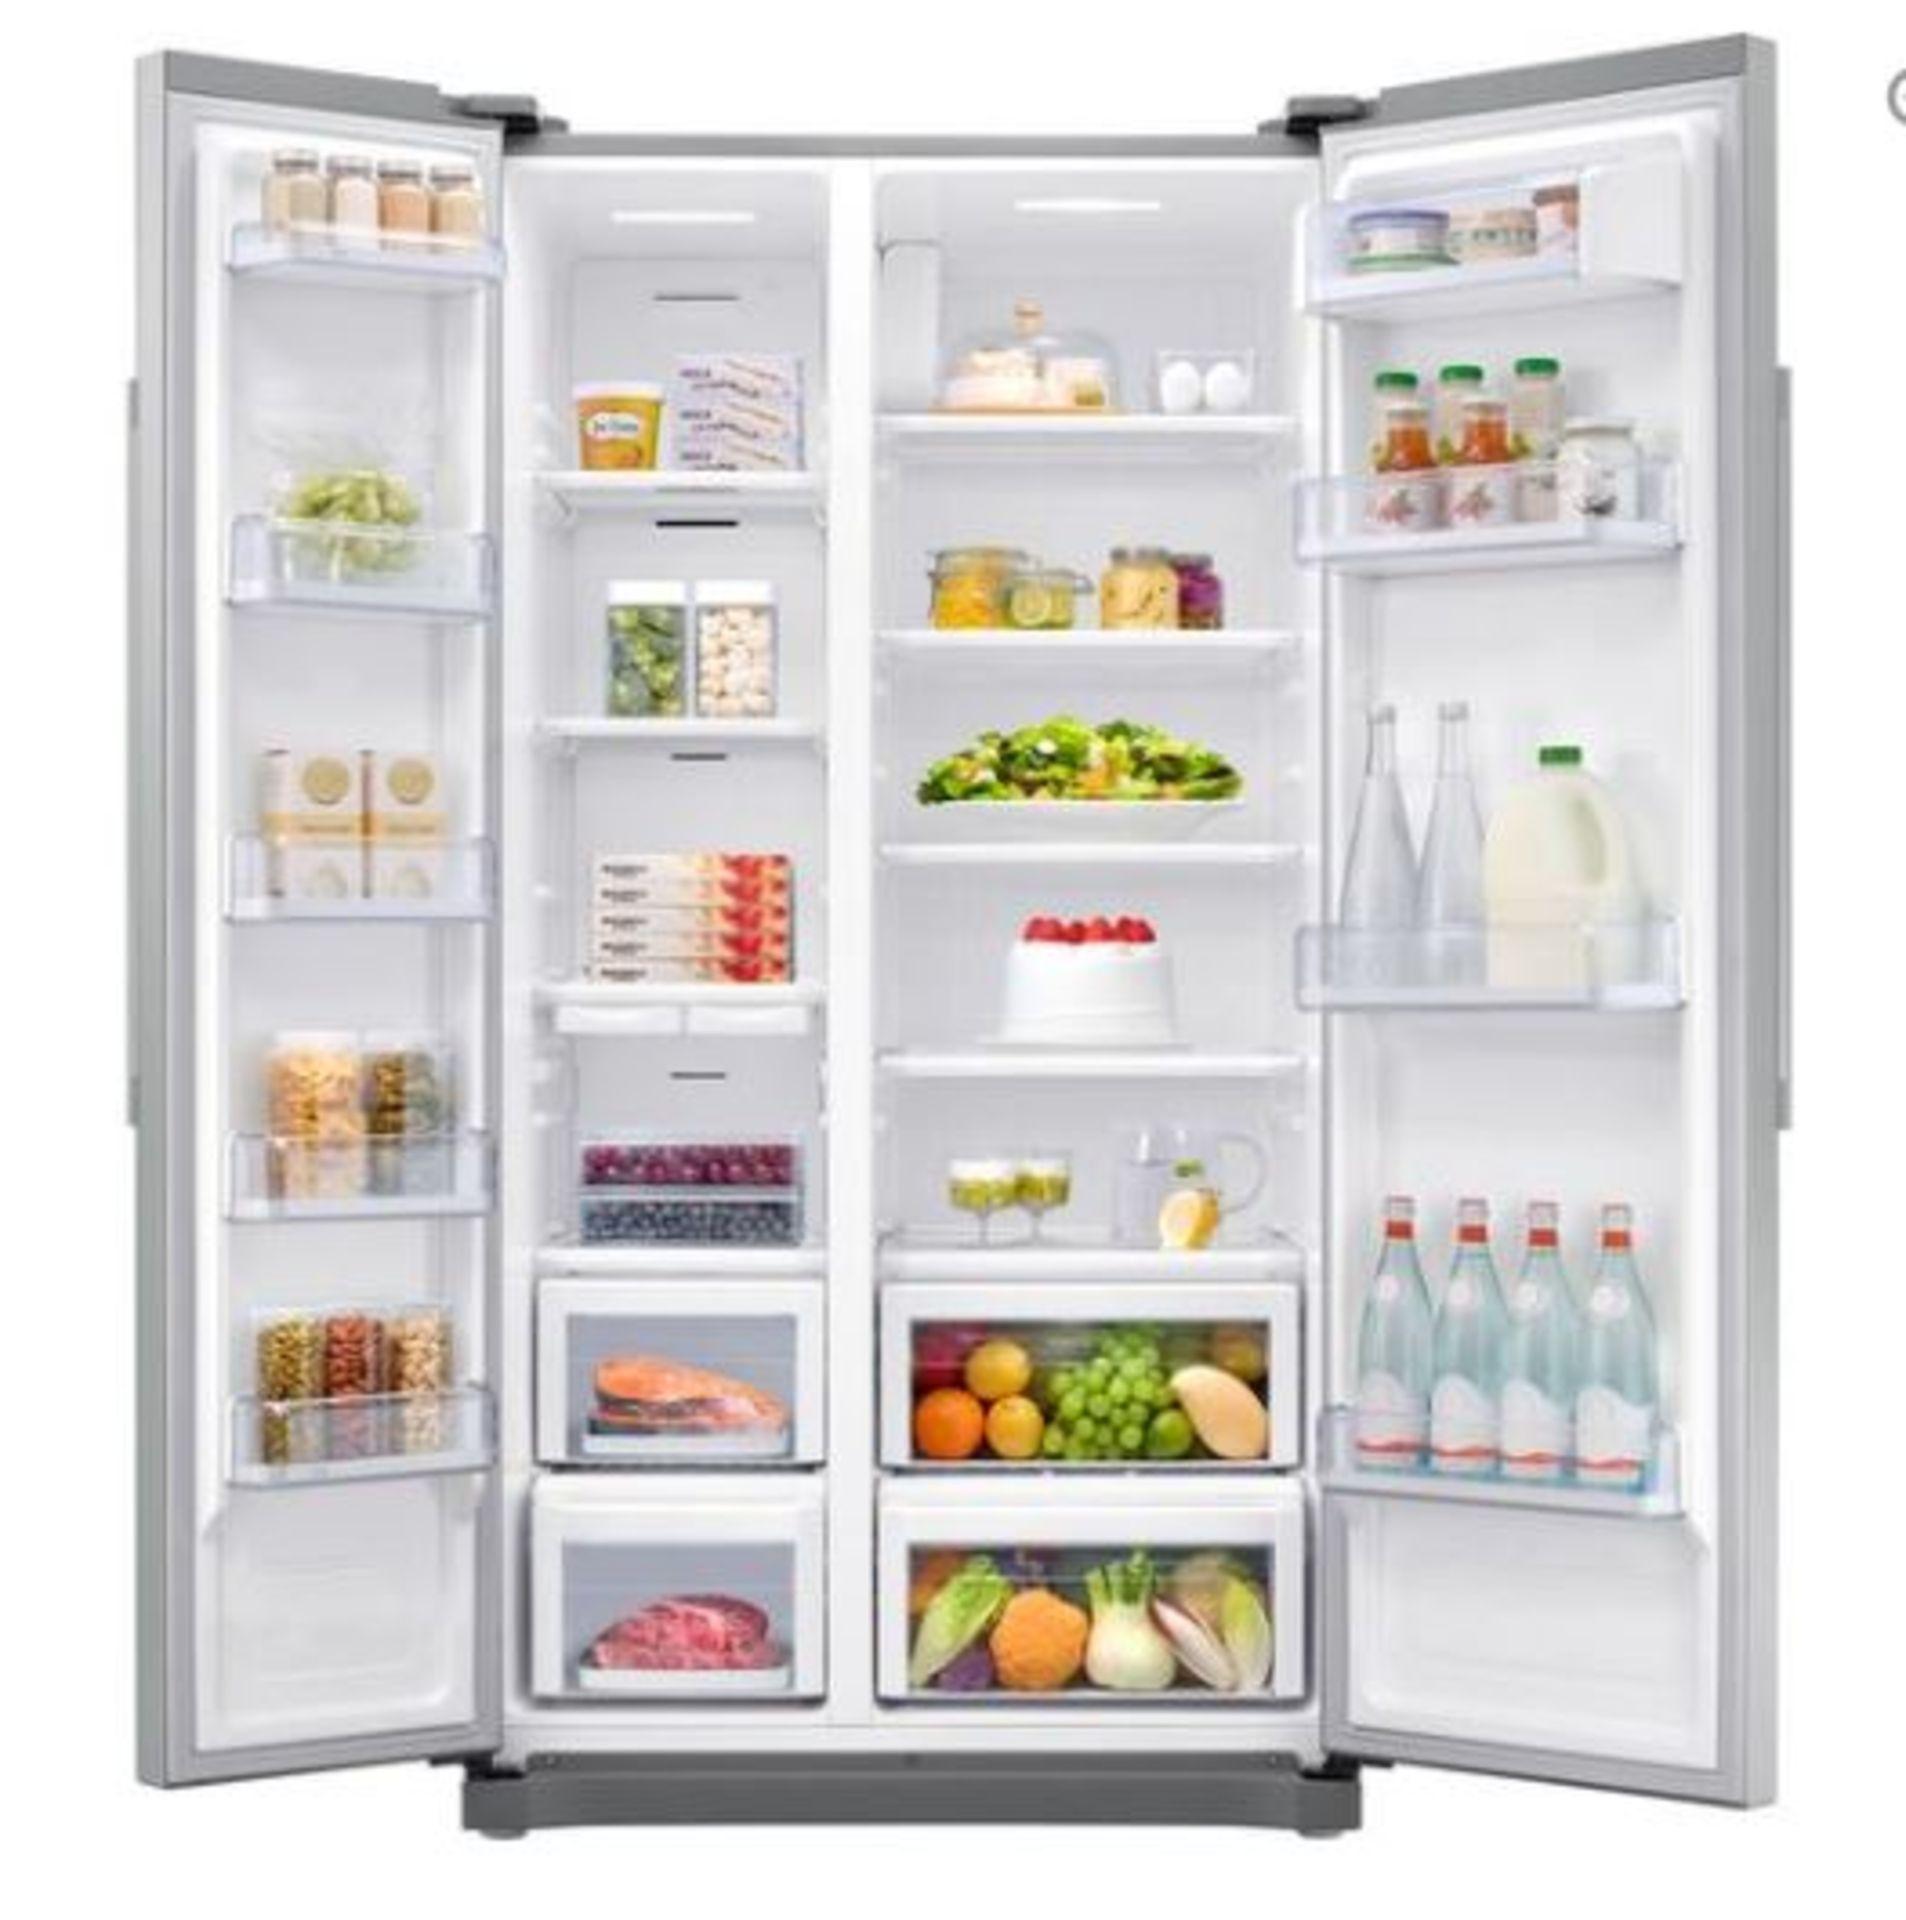 Pallet of 1 Samsung plain door Fridge freezer. Latest selling price £899.99 - Image 2 of 7